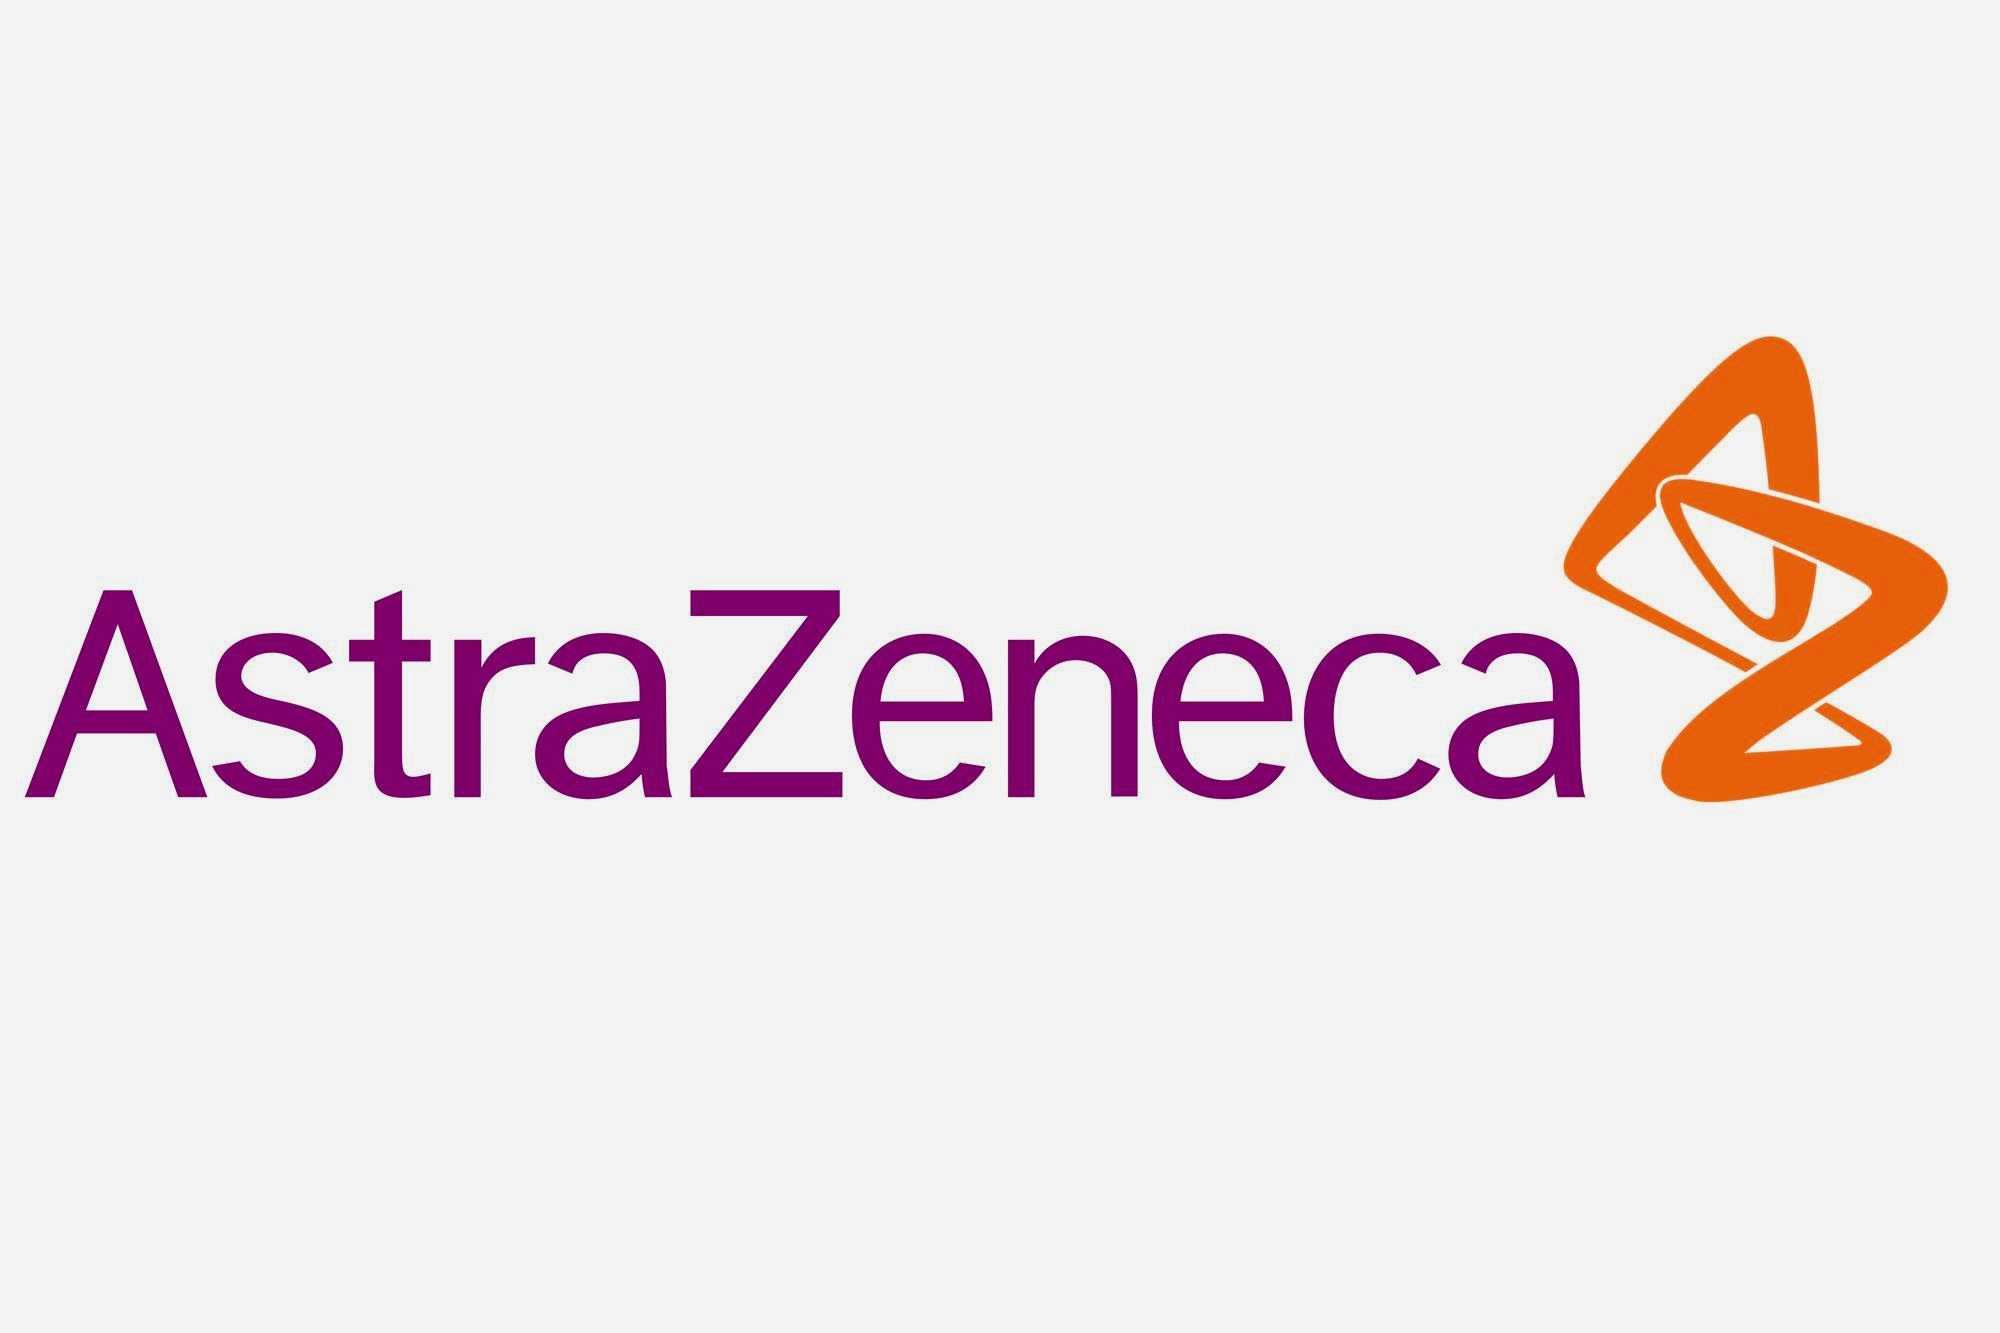 astrazeneca - AstraZeneca + Microsoft προϊόντα με μηχανική μάθηση